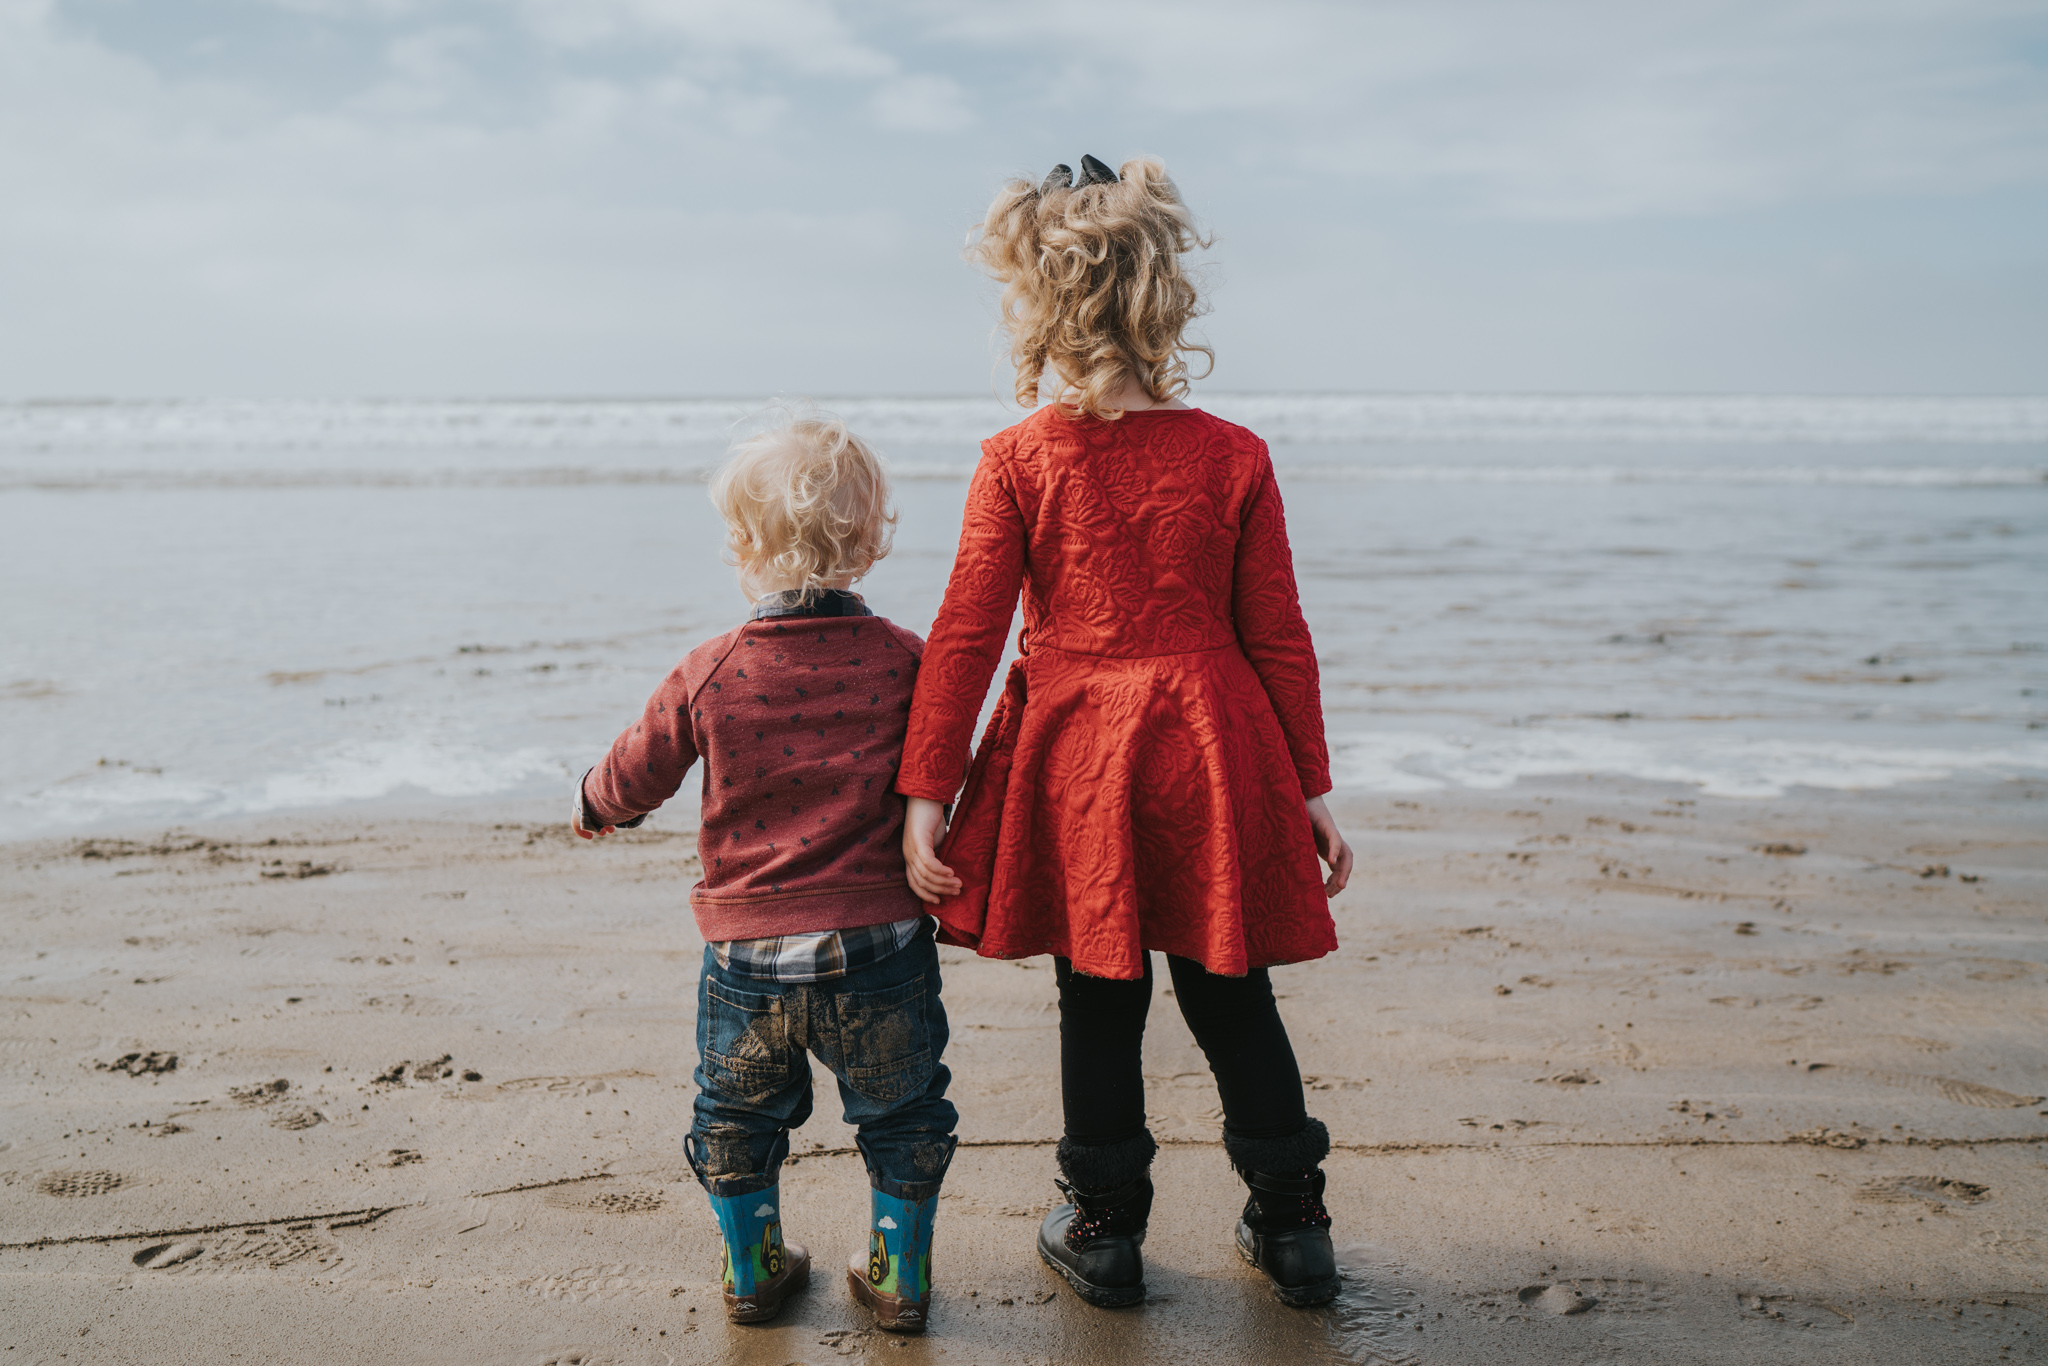 beach-family-session-westward-ho-north-devon-grace-elizabeth-devon-family-wedding-photographer-essex-devon-norfolk (9 of 43).jpg